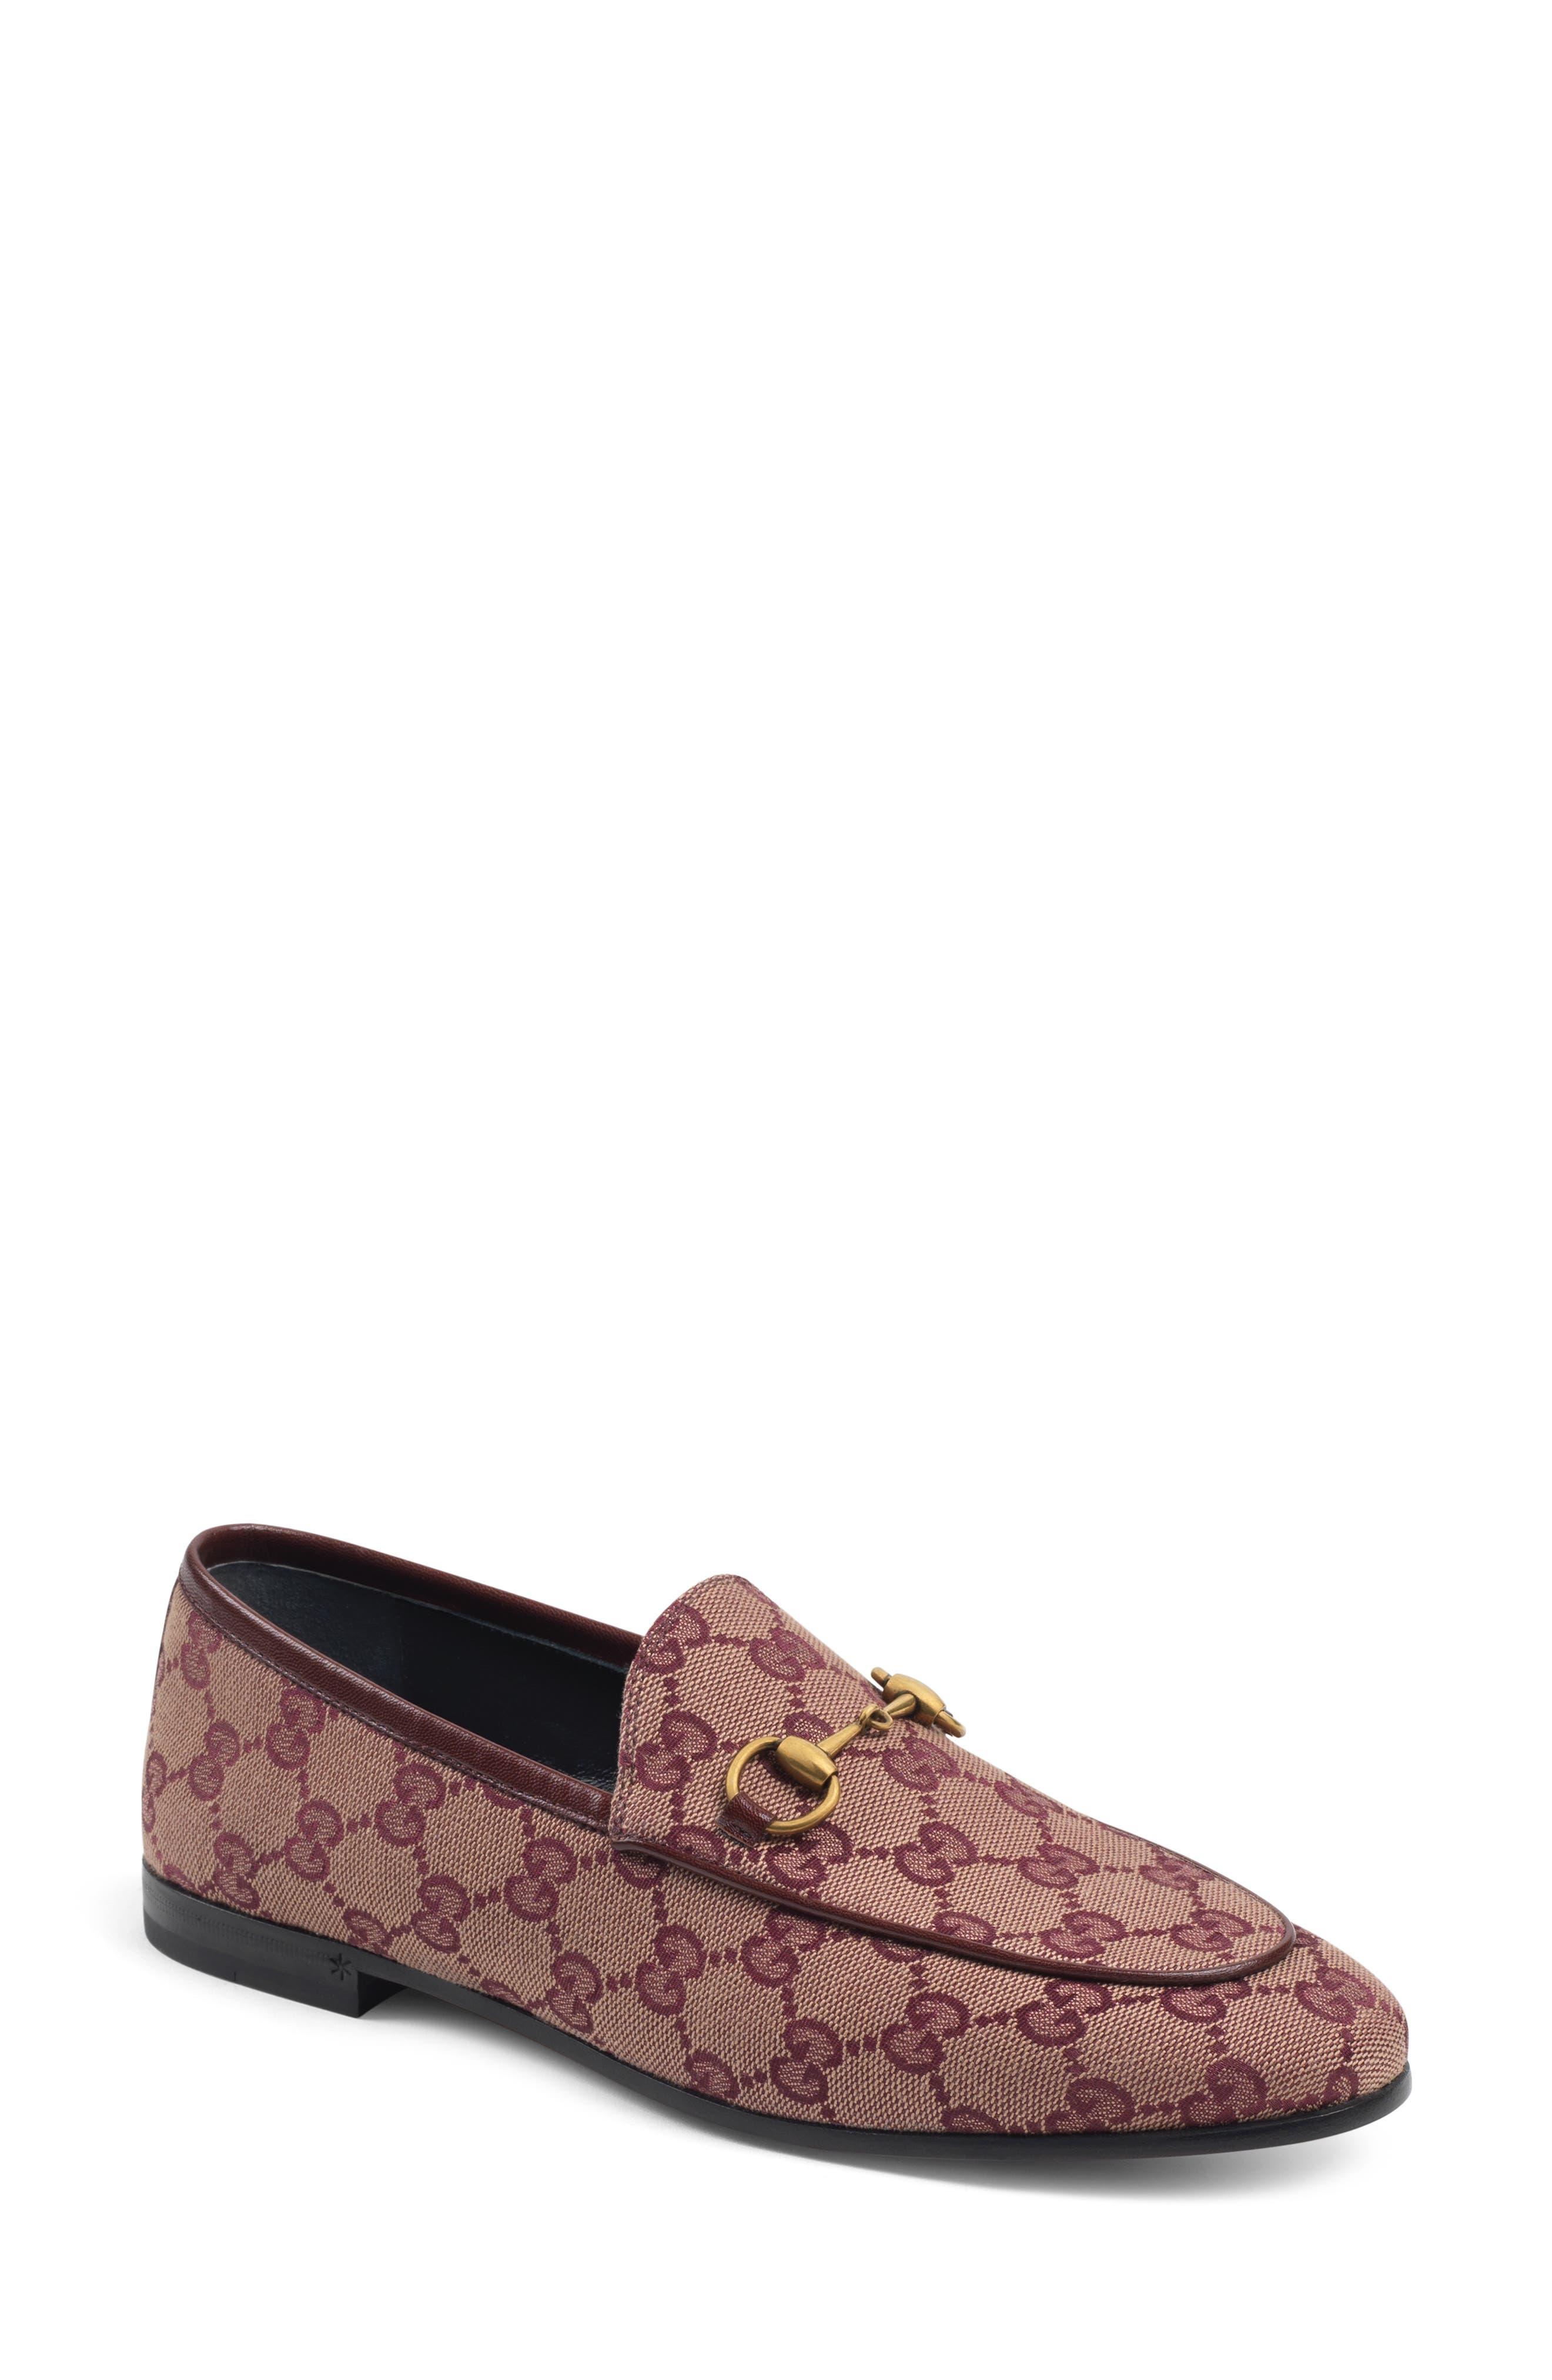 Gucci New Jordaan Loafer - Burgundy